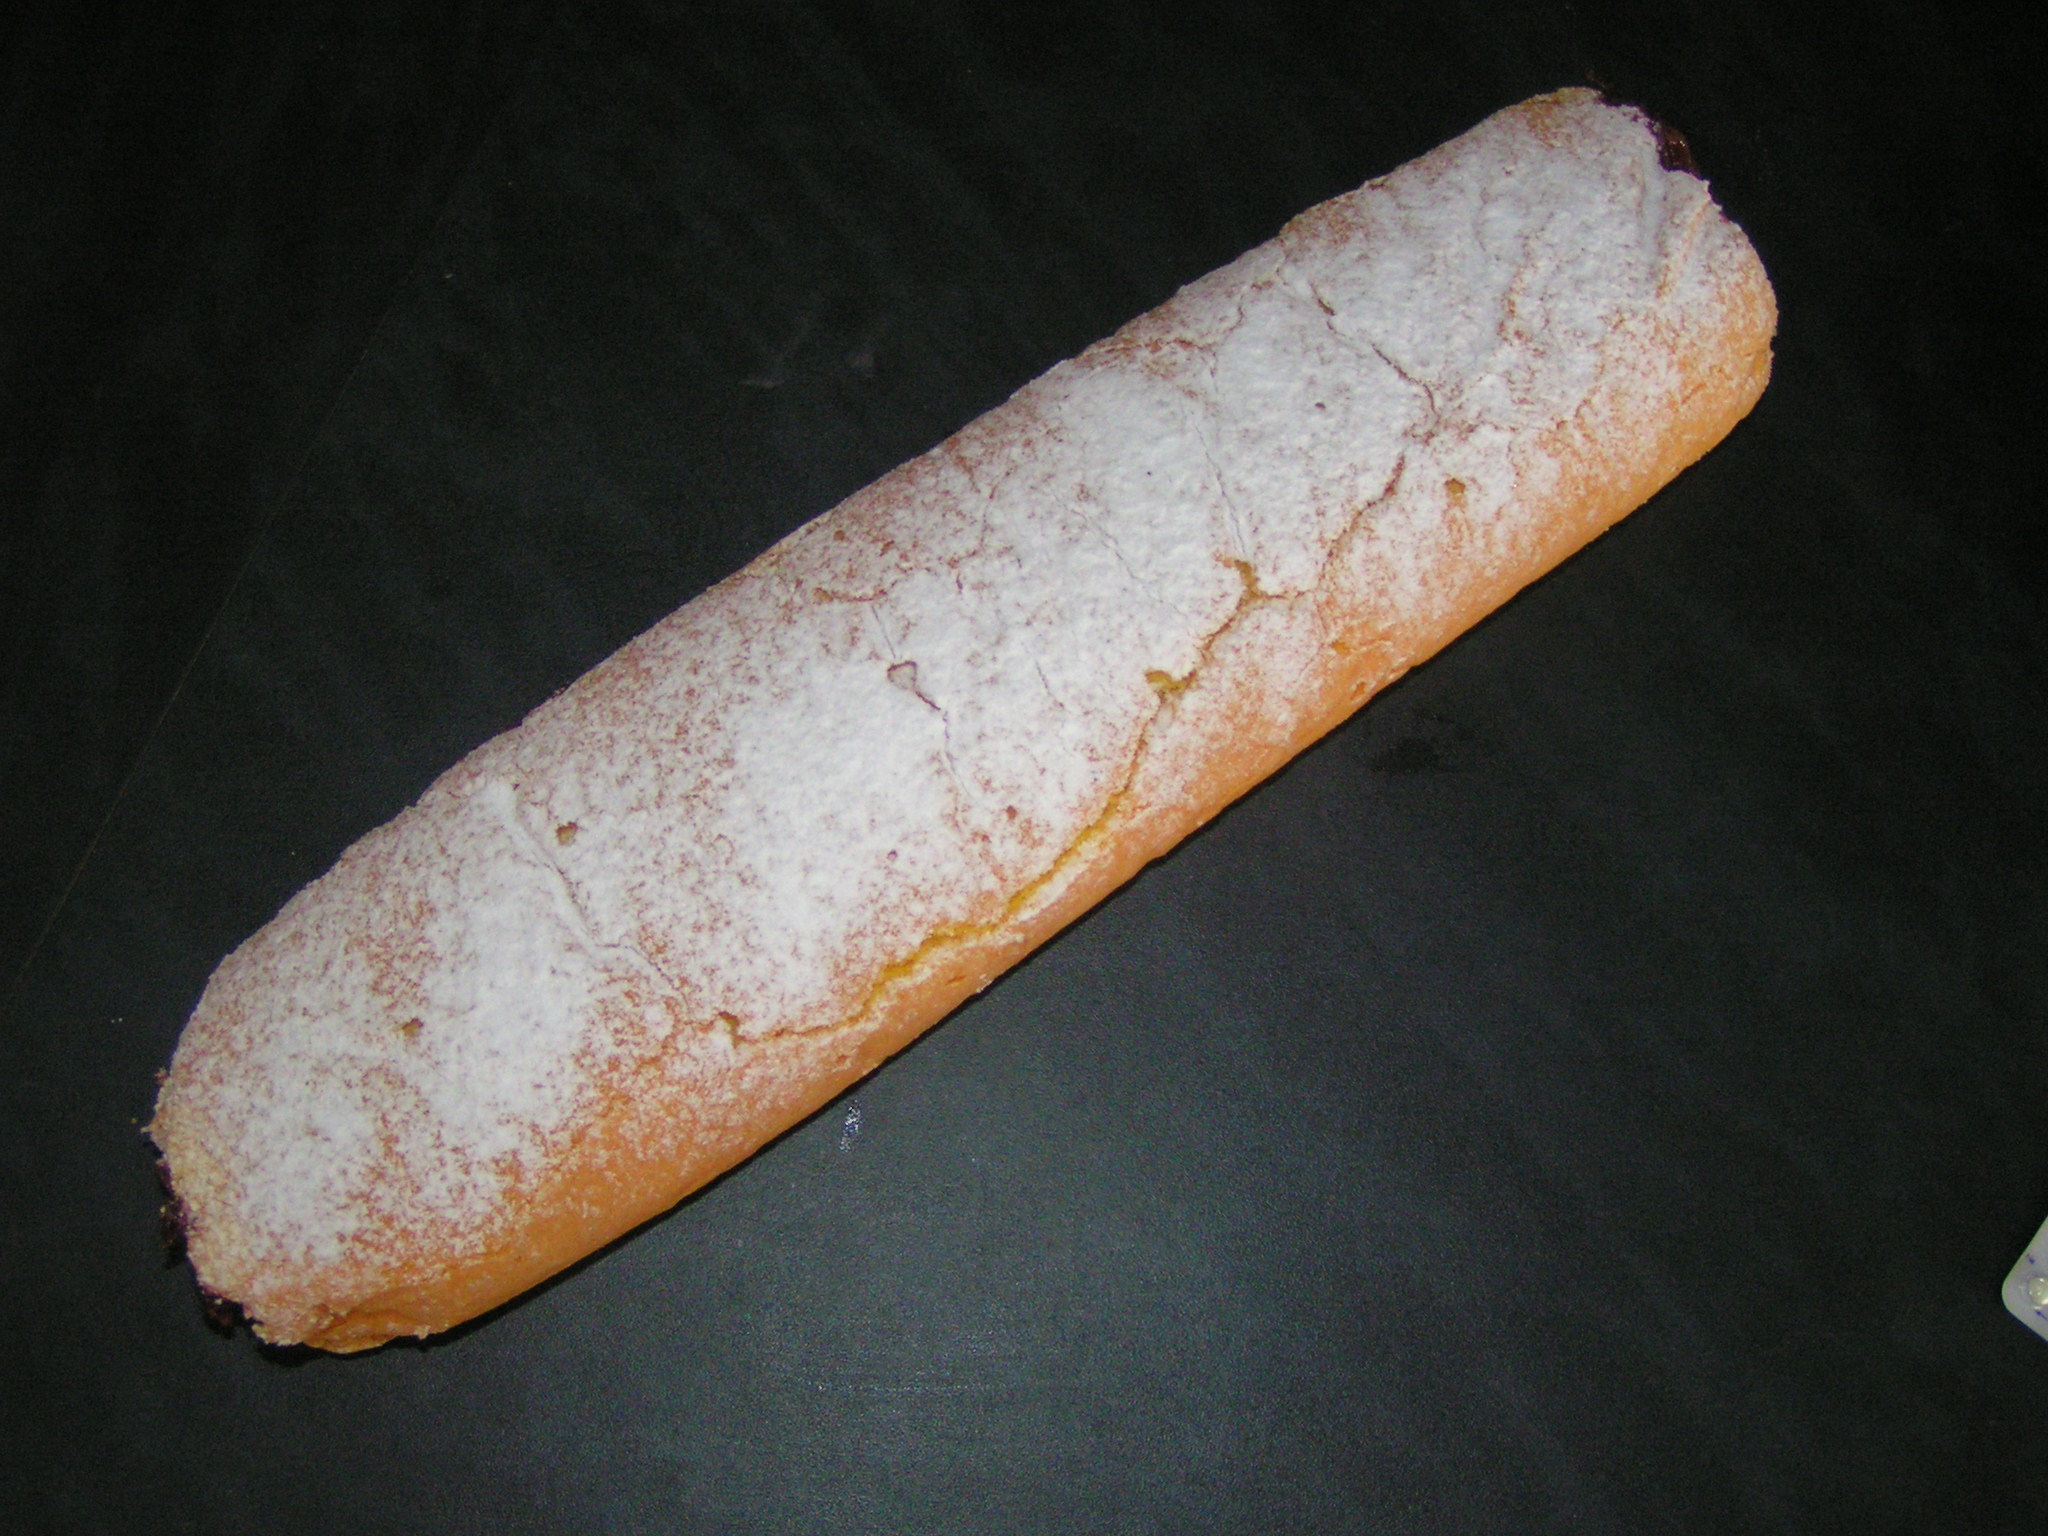 Recept Roláda s marmeládou - Smotaná roláda, pocukrovaná moučkovým cukrem.